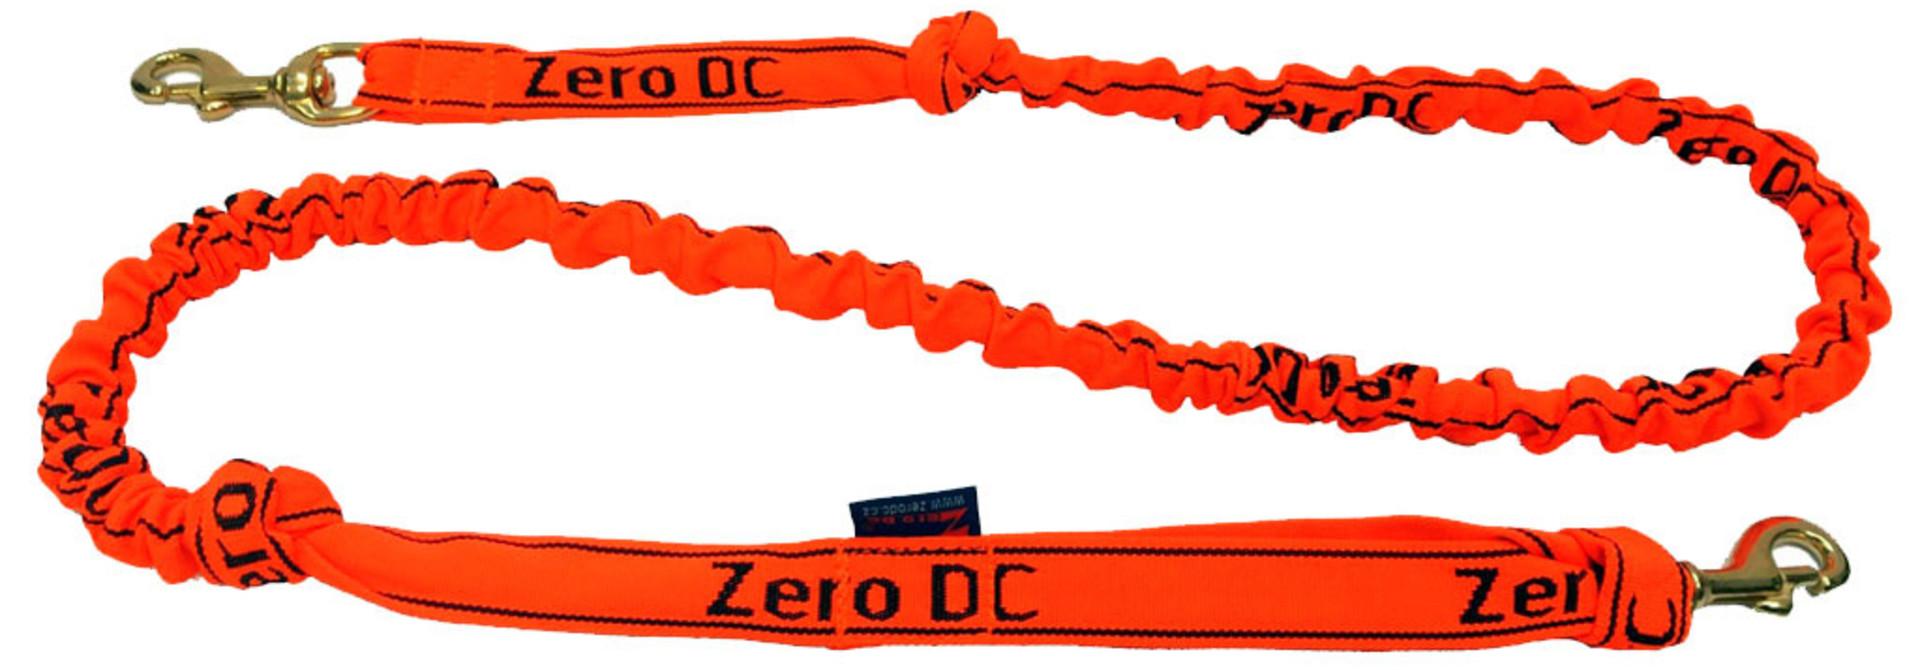 Zero DC Canicross Line Pro